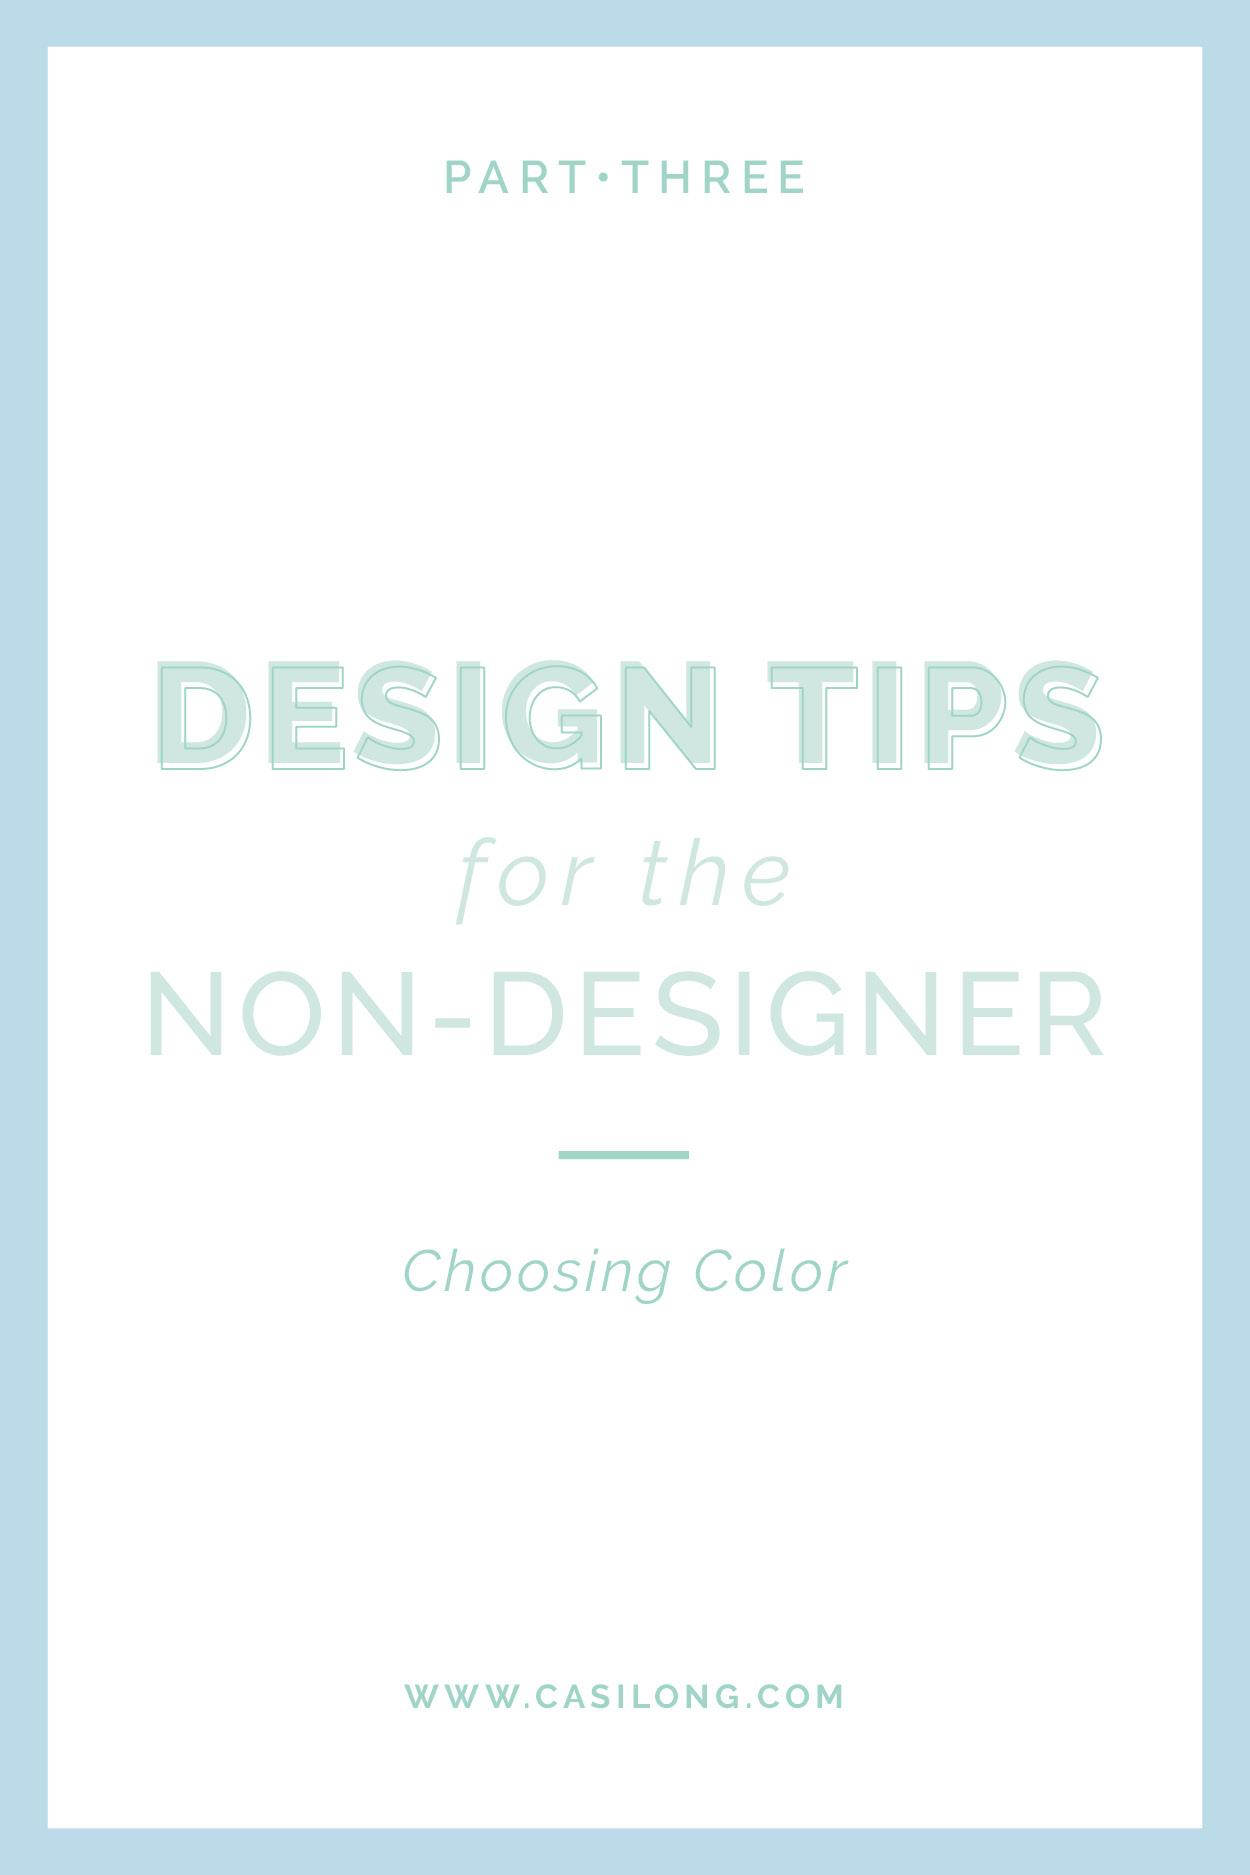 Design Tips for the Non-Designer Part 3 | Choosing Color | casilong.com/blog